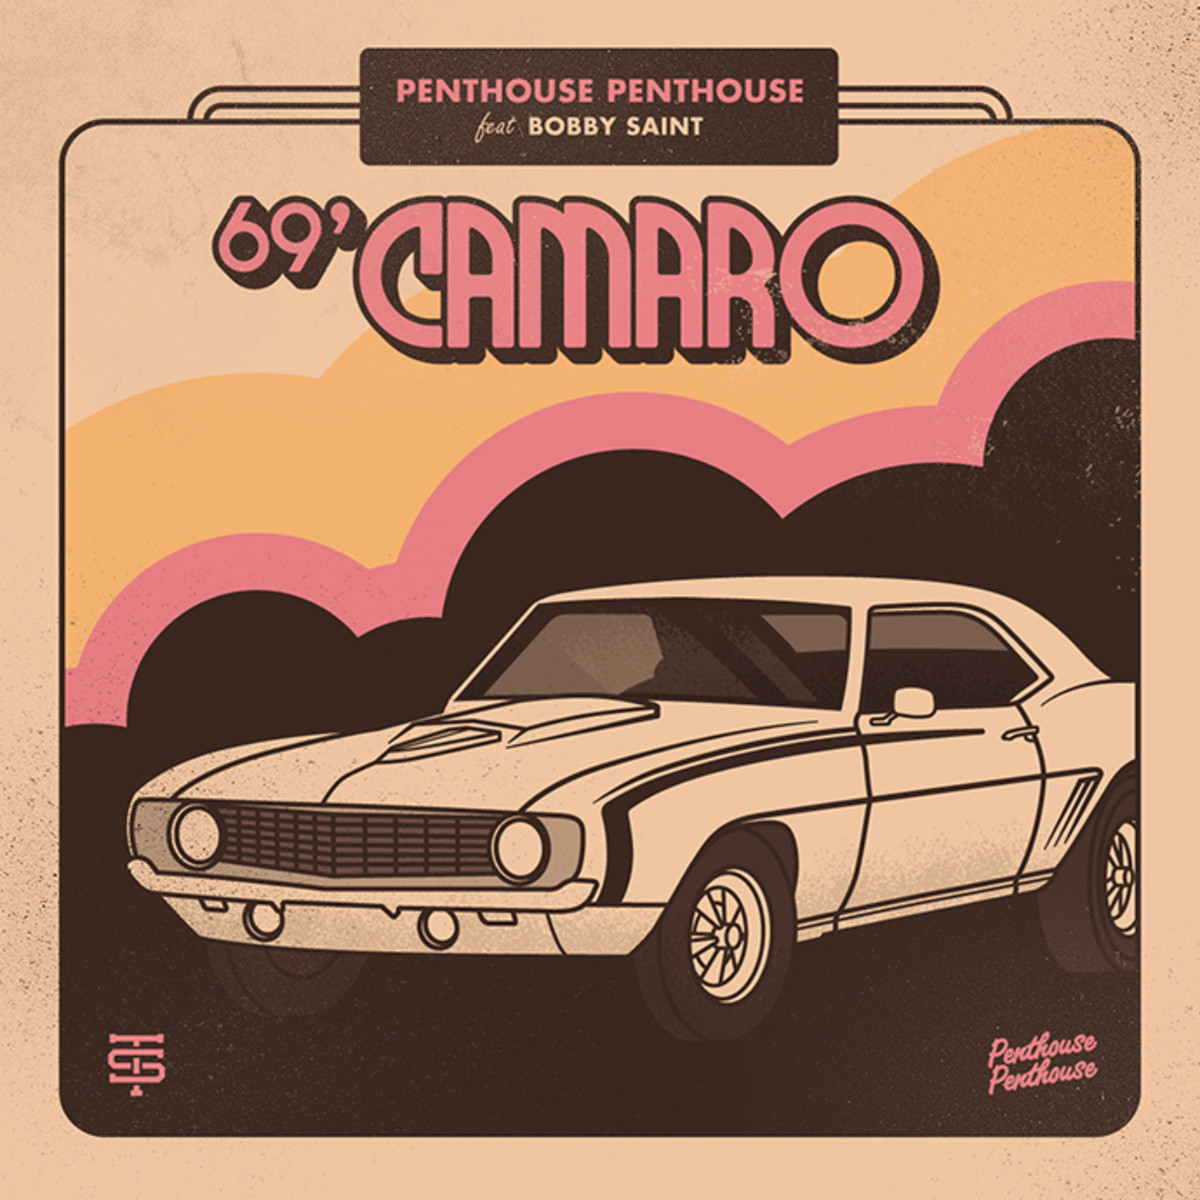 Penthouse Penthouse's Summer Crush Playlist